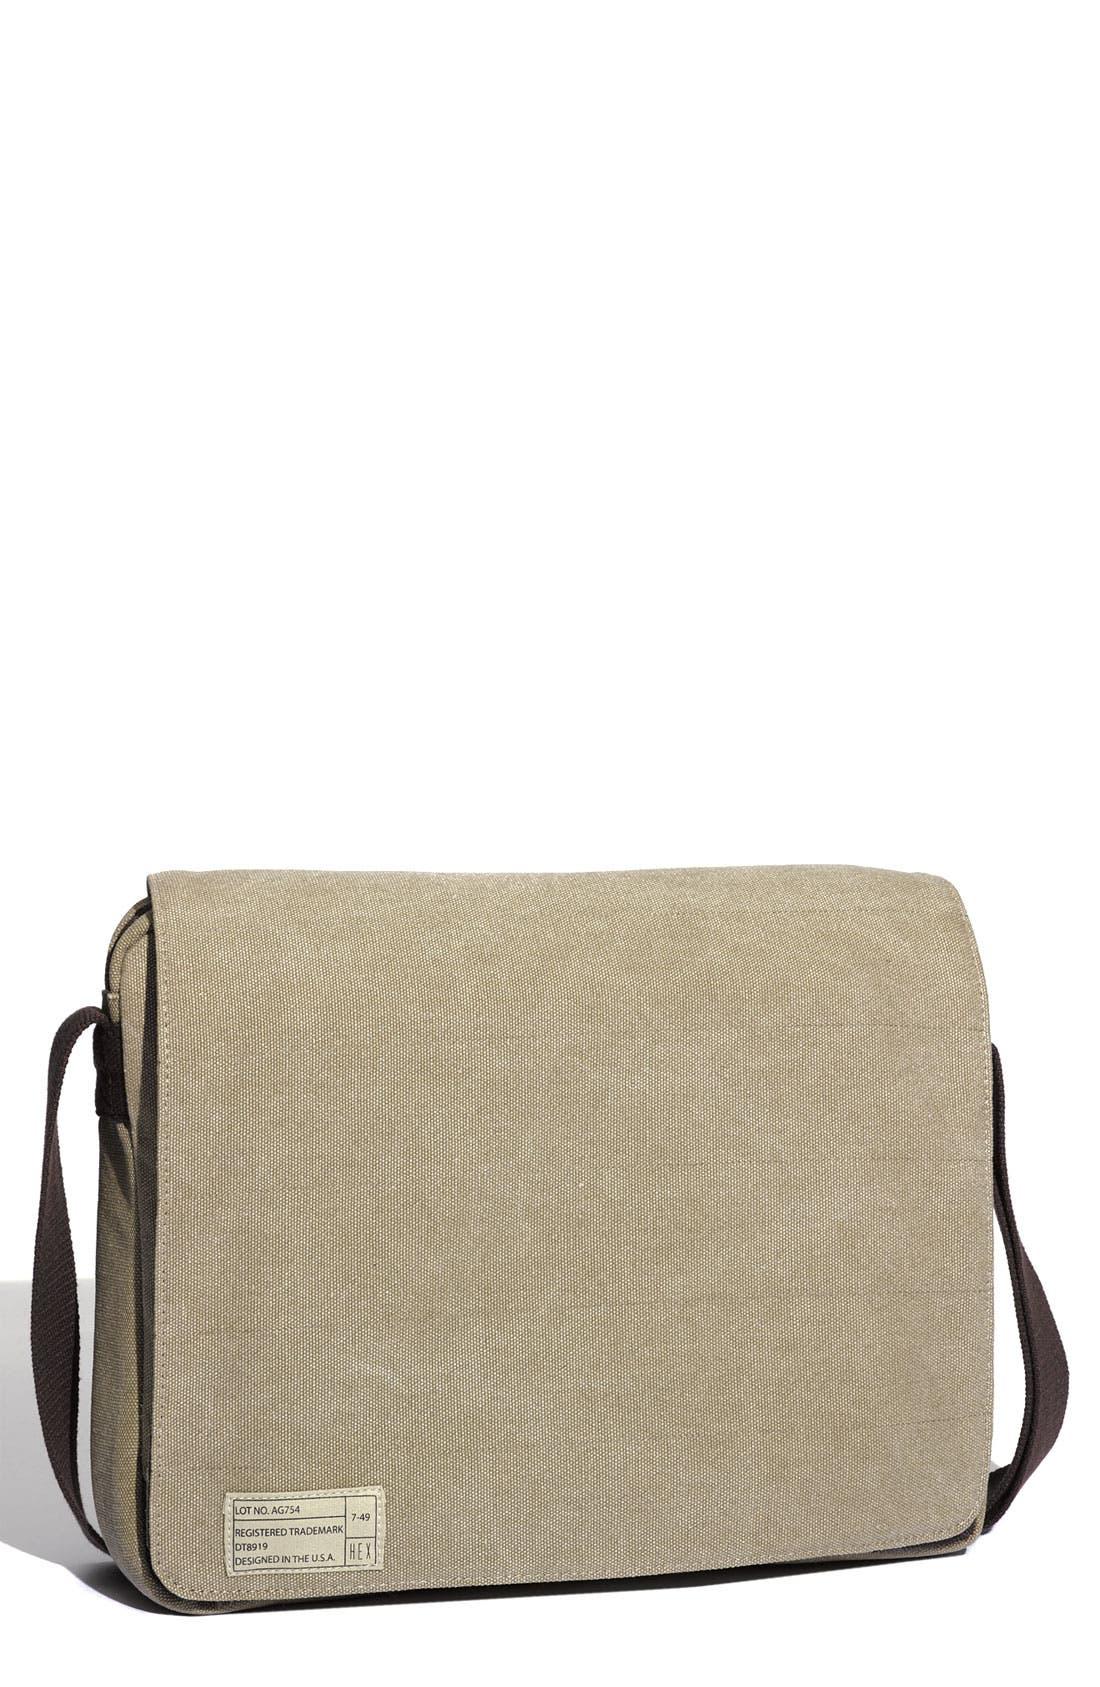 Main Image - HEX iPad Messenger Bag